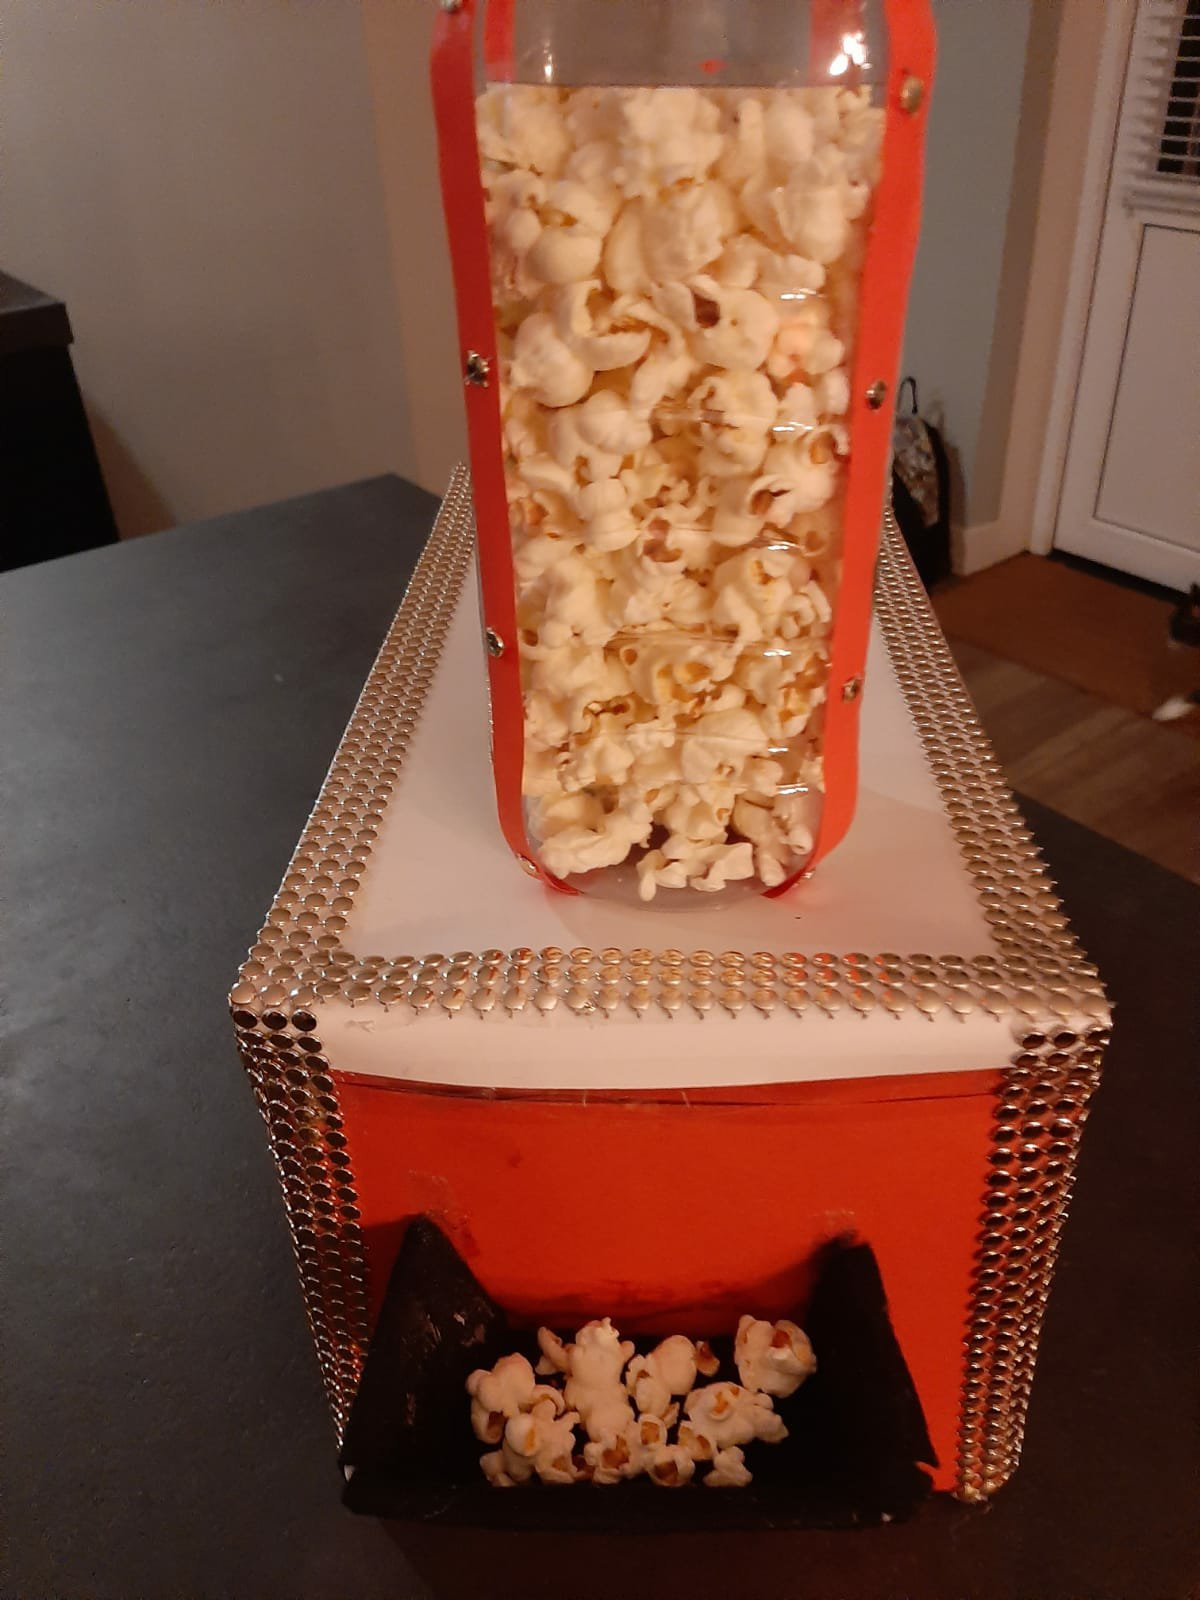 Surprise popcorn